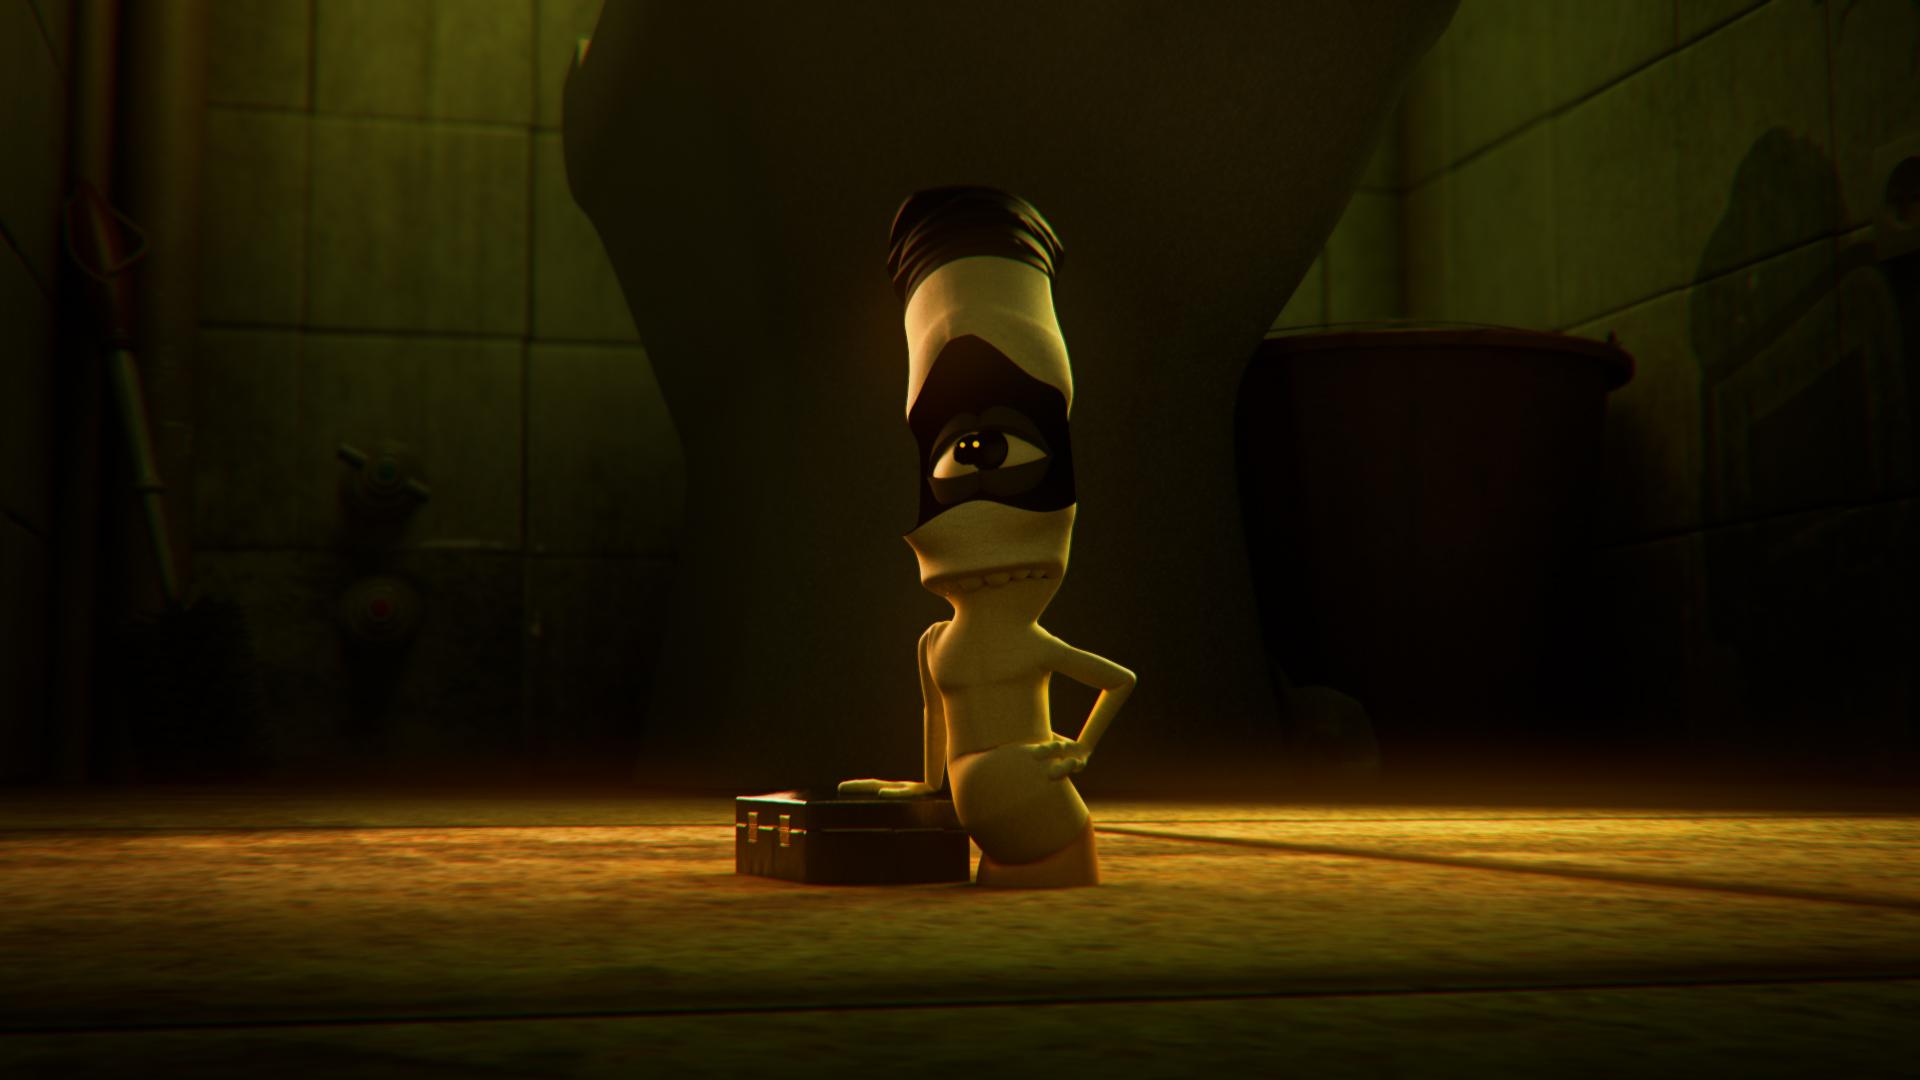 animacion_personajes_3d_animal_studios-1